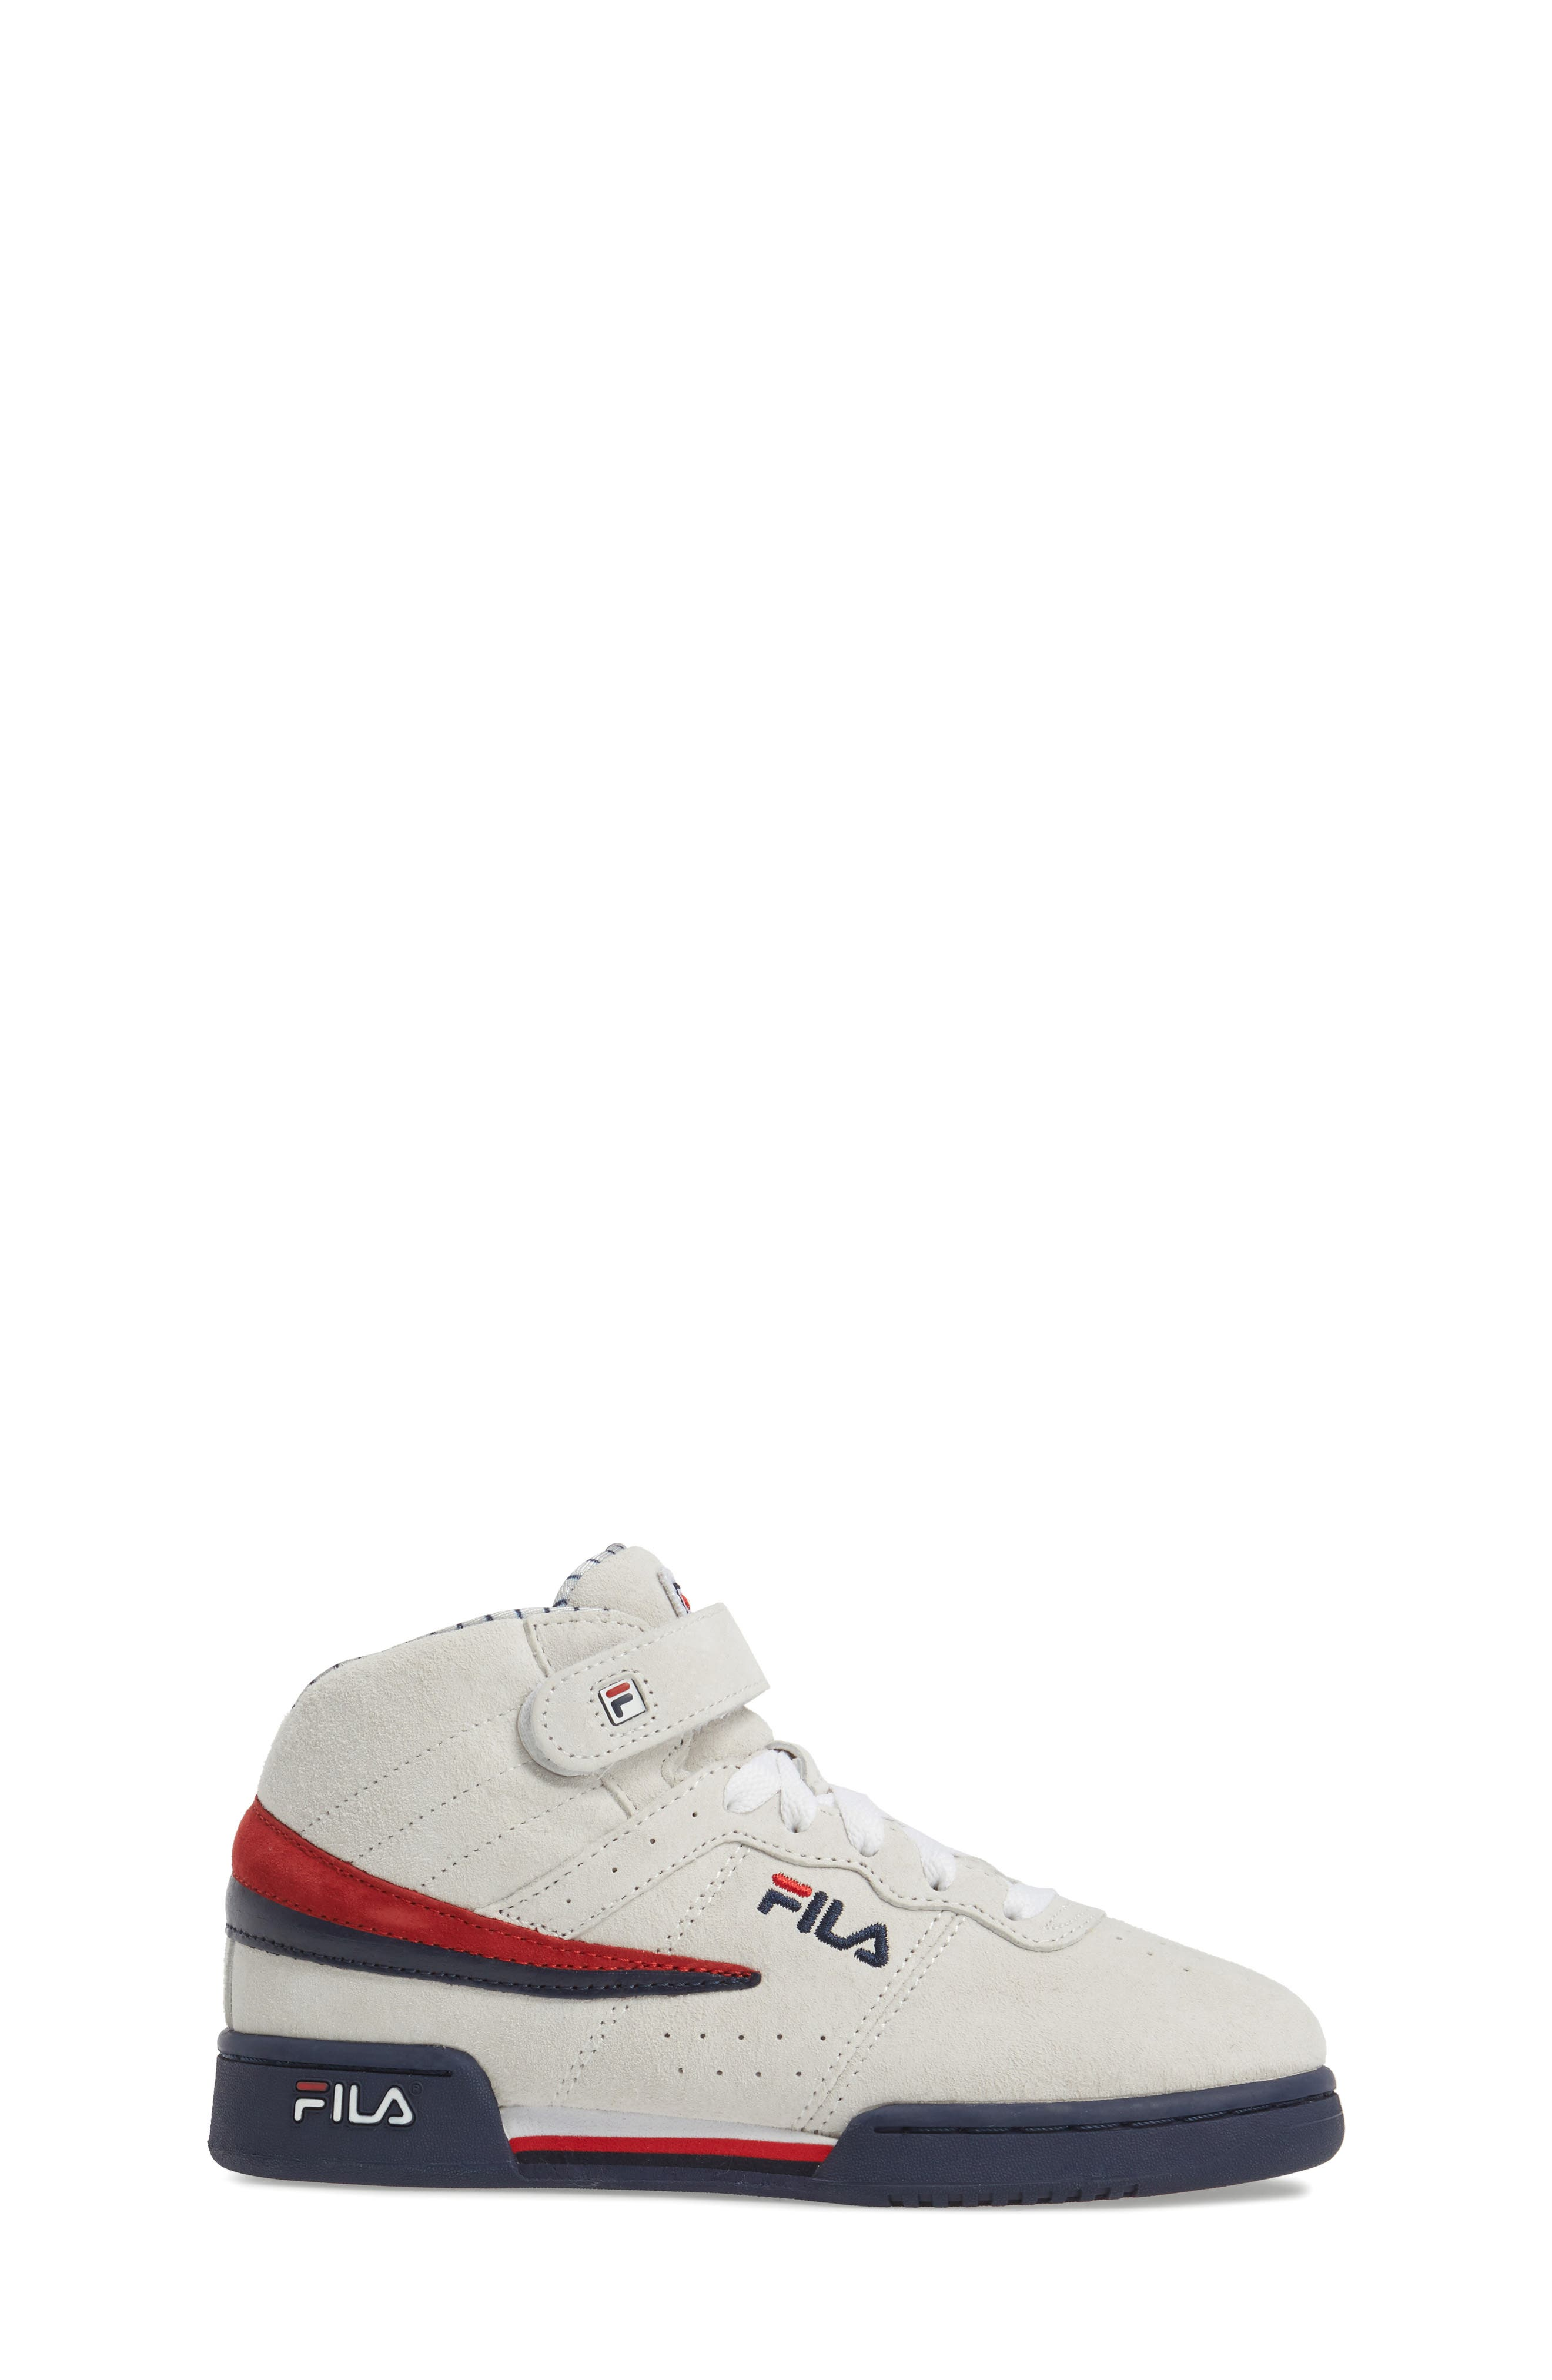 FILA, F-13 Mid Pinstripe Sneaker, Alternate thumbnail 3, color, 150